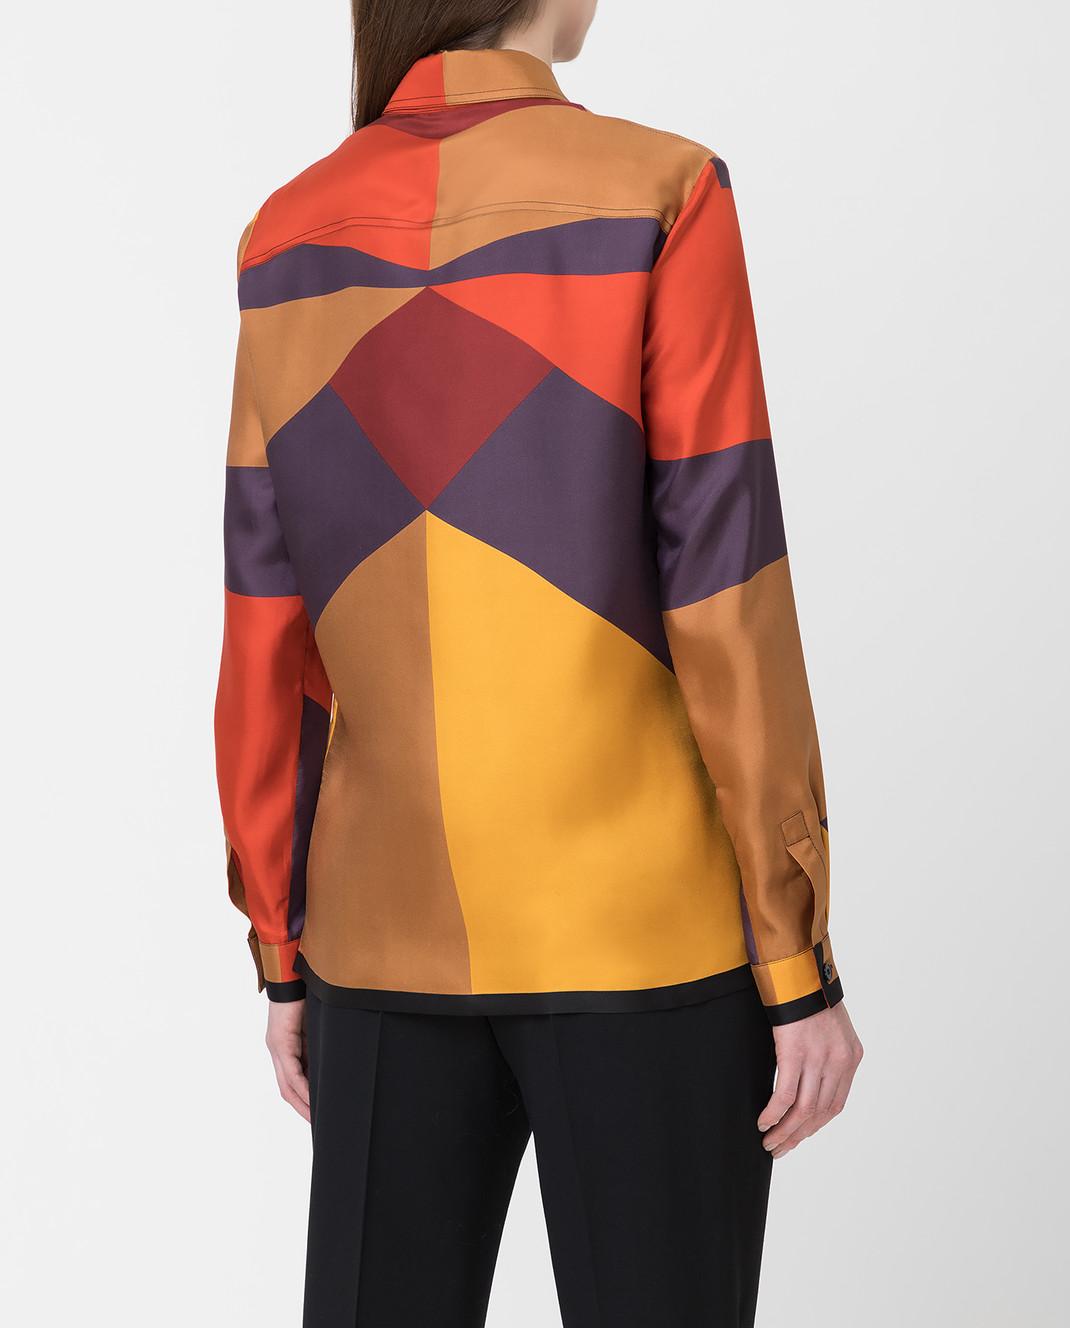 Bottega Veneta Коричневая рубашка из шелка 538599 изображение 4